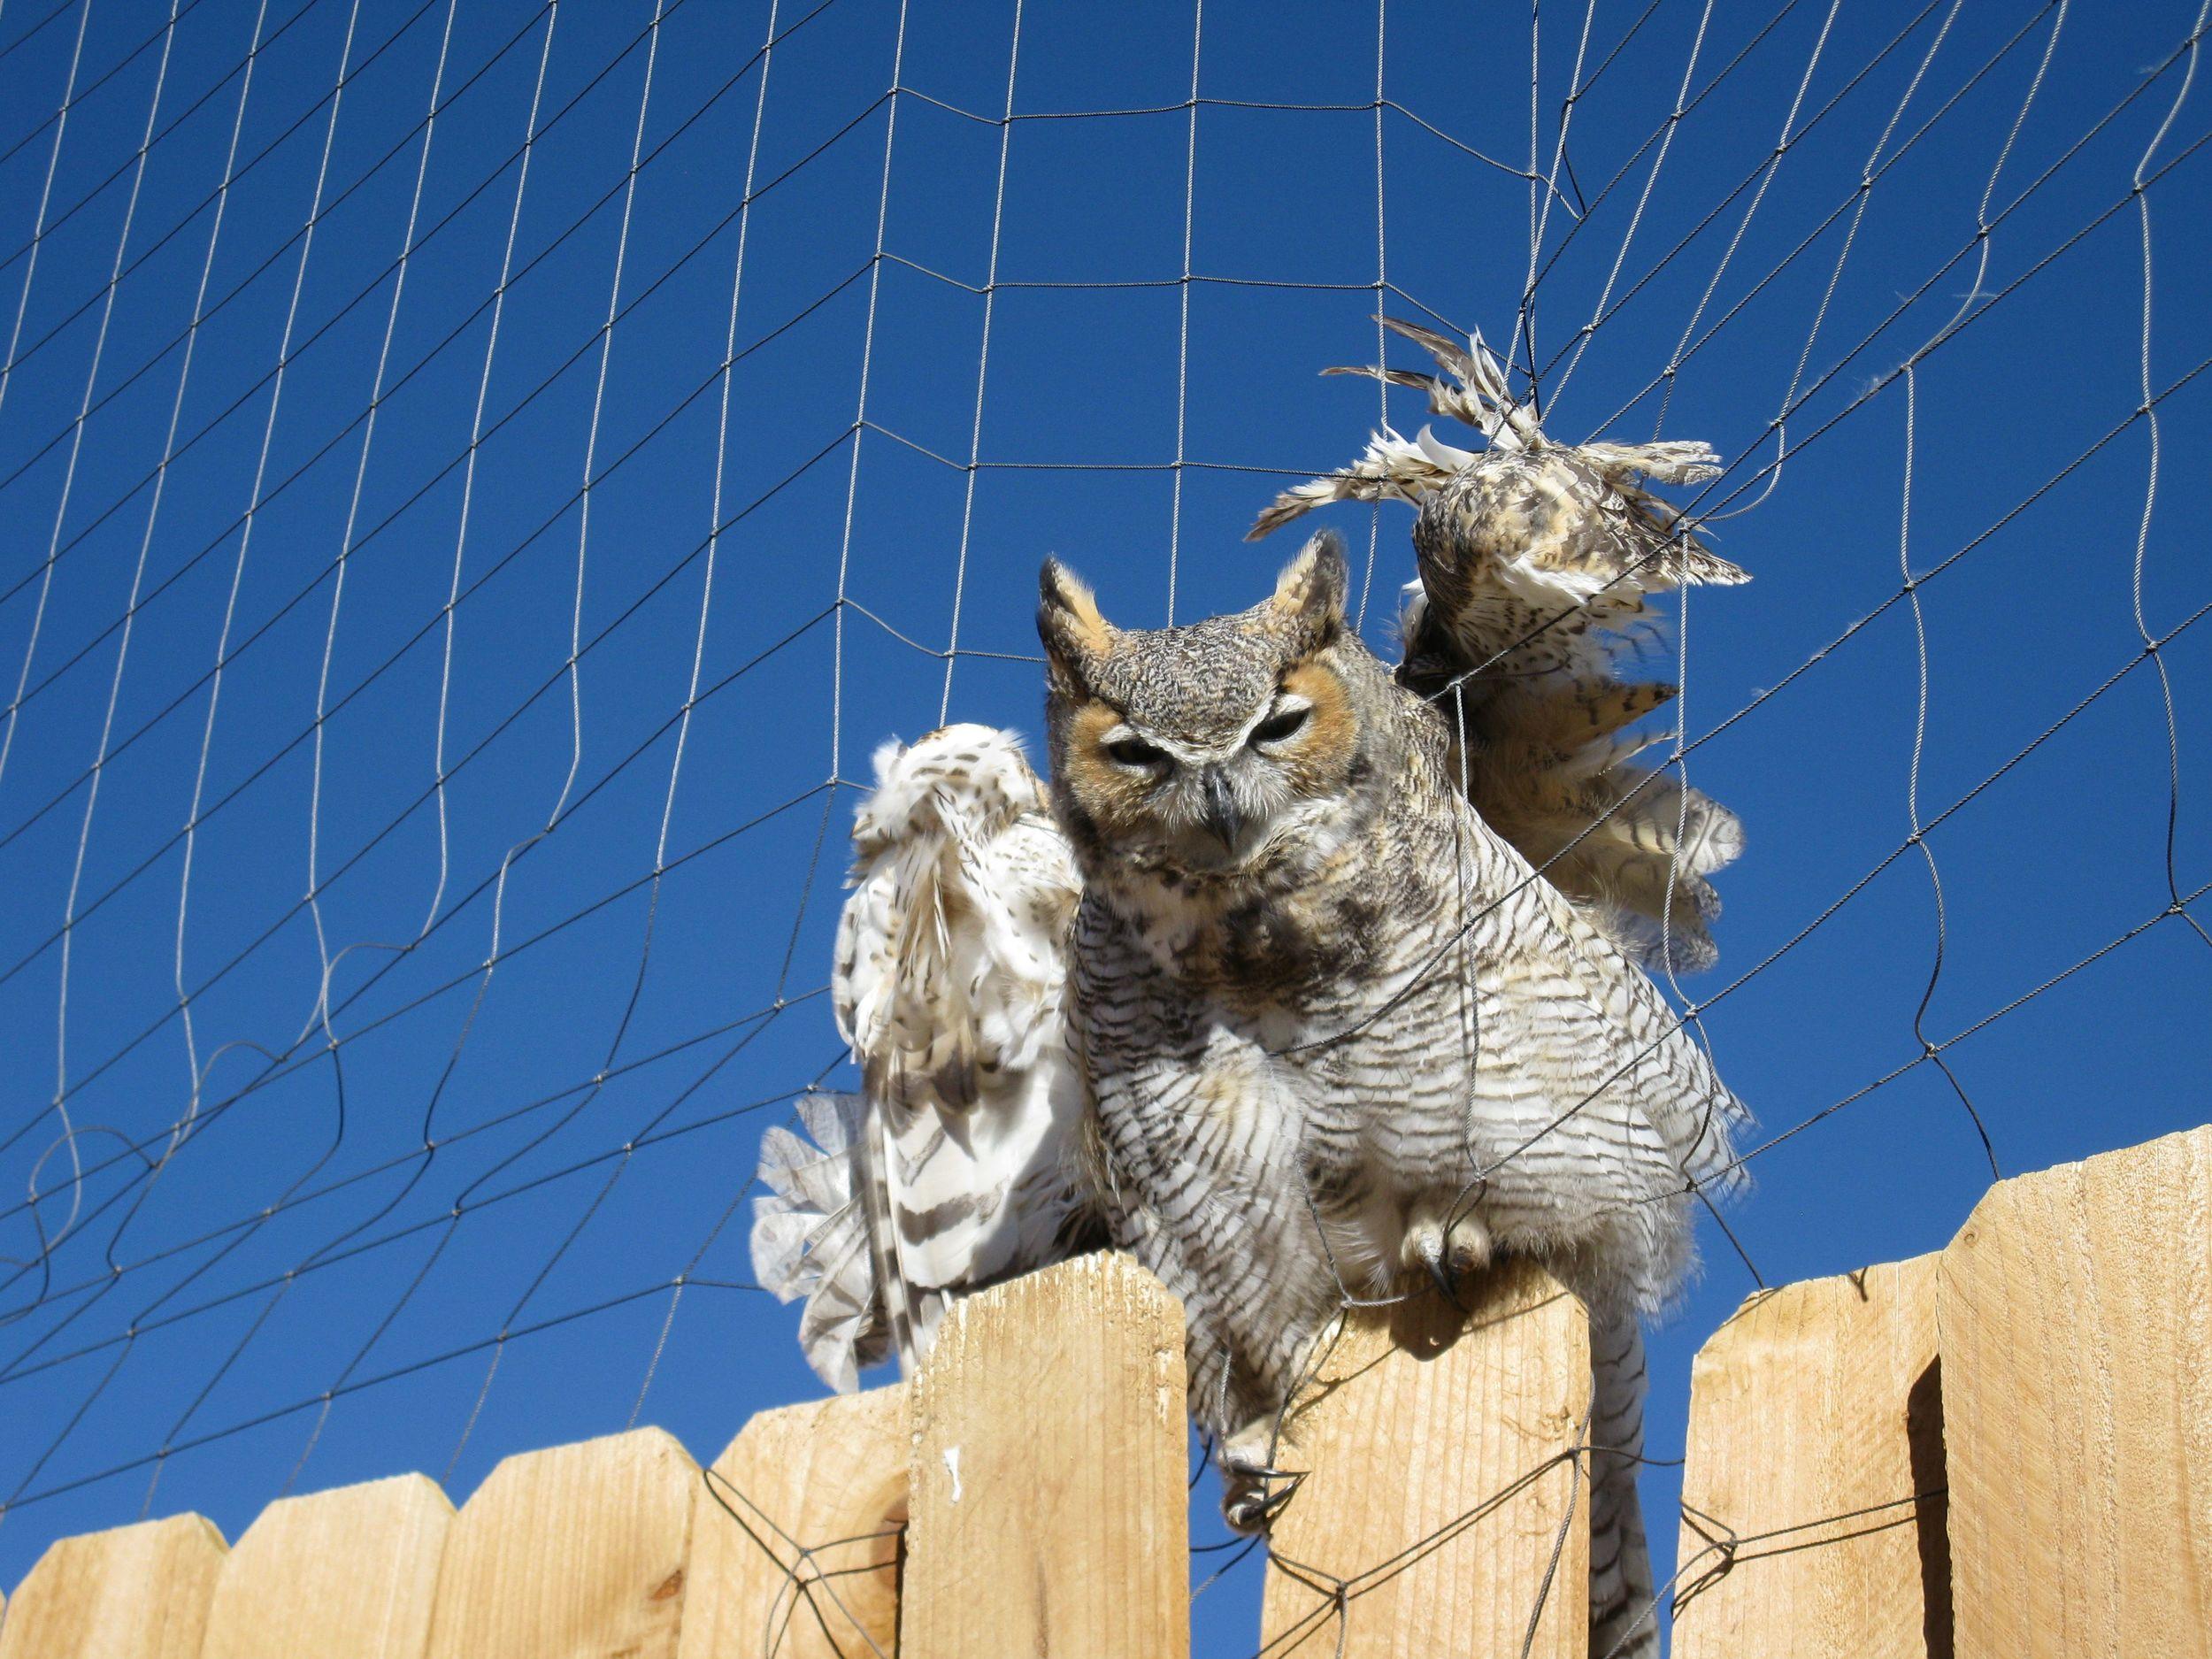 Great Horned Owl in Net 007.jpg